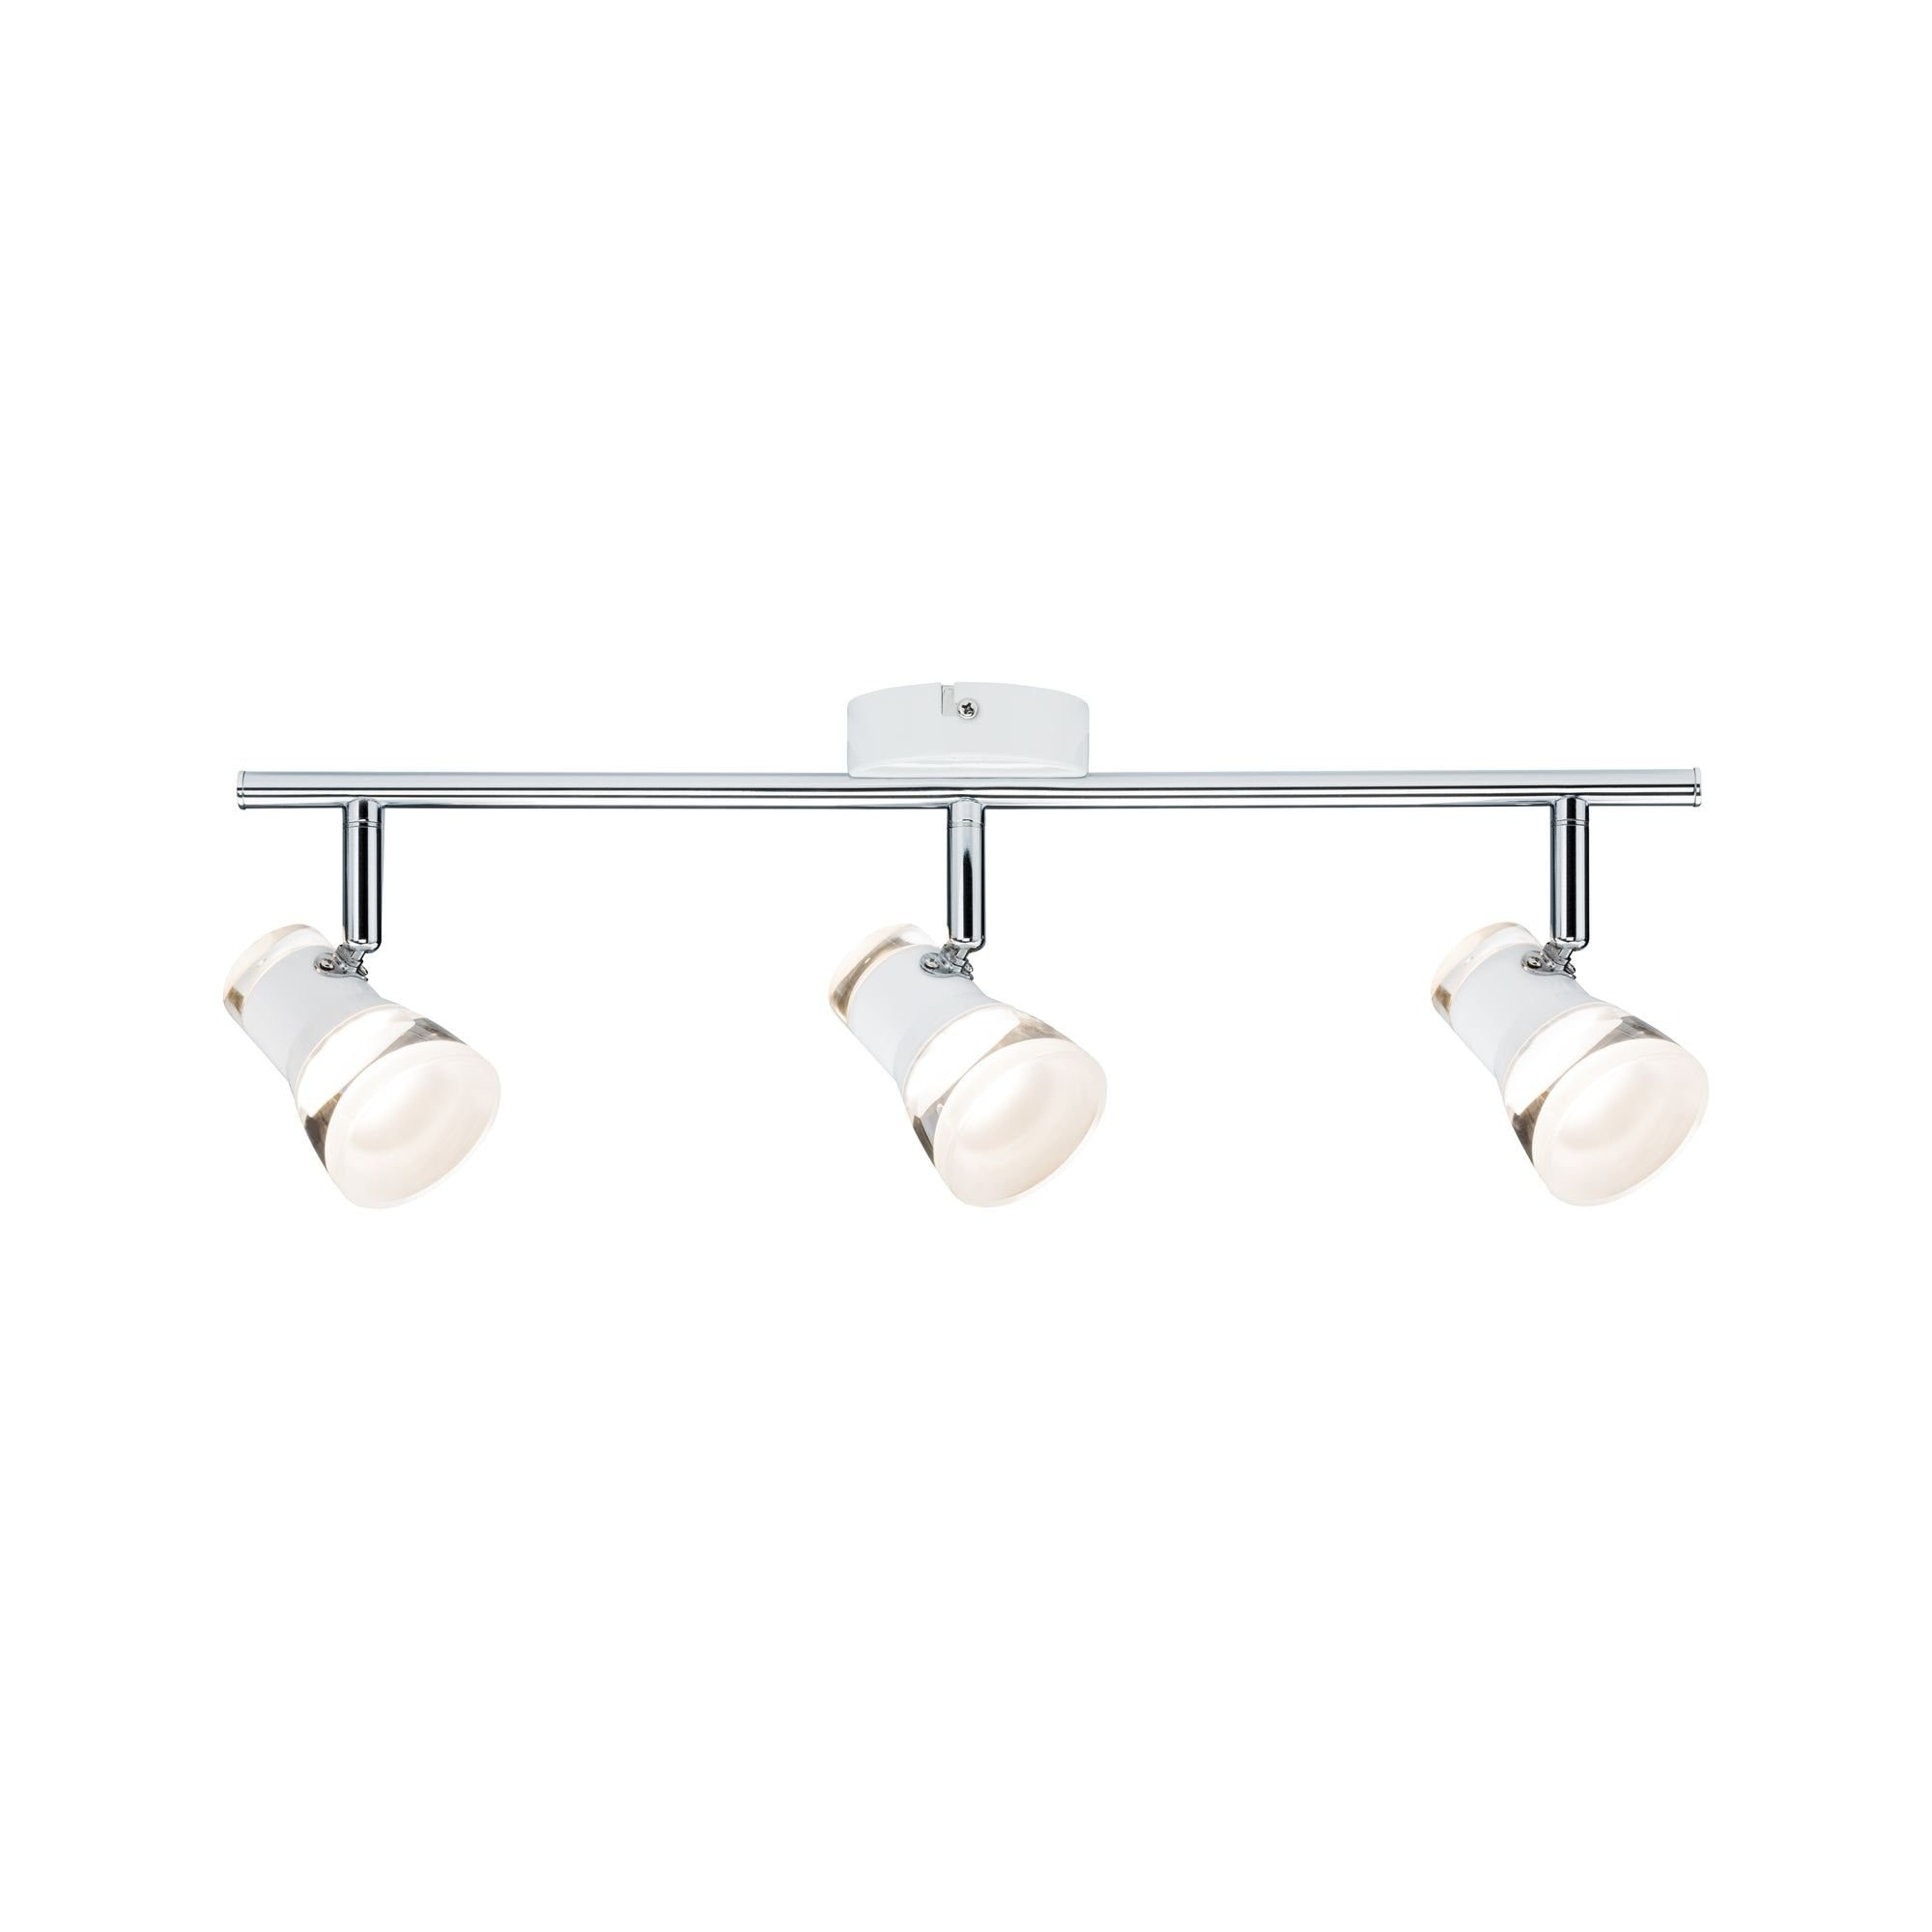 Paulmann LED Deckenleuchte 3er-Spot Weiß/Chrom Clear inkl. Leuchtmittel 3x4,3W, 1 St., Warmweiß